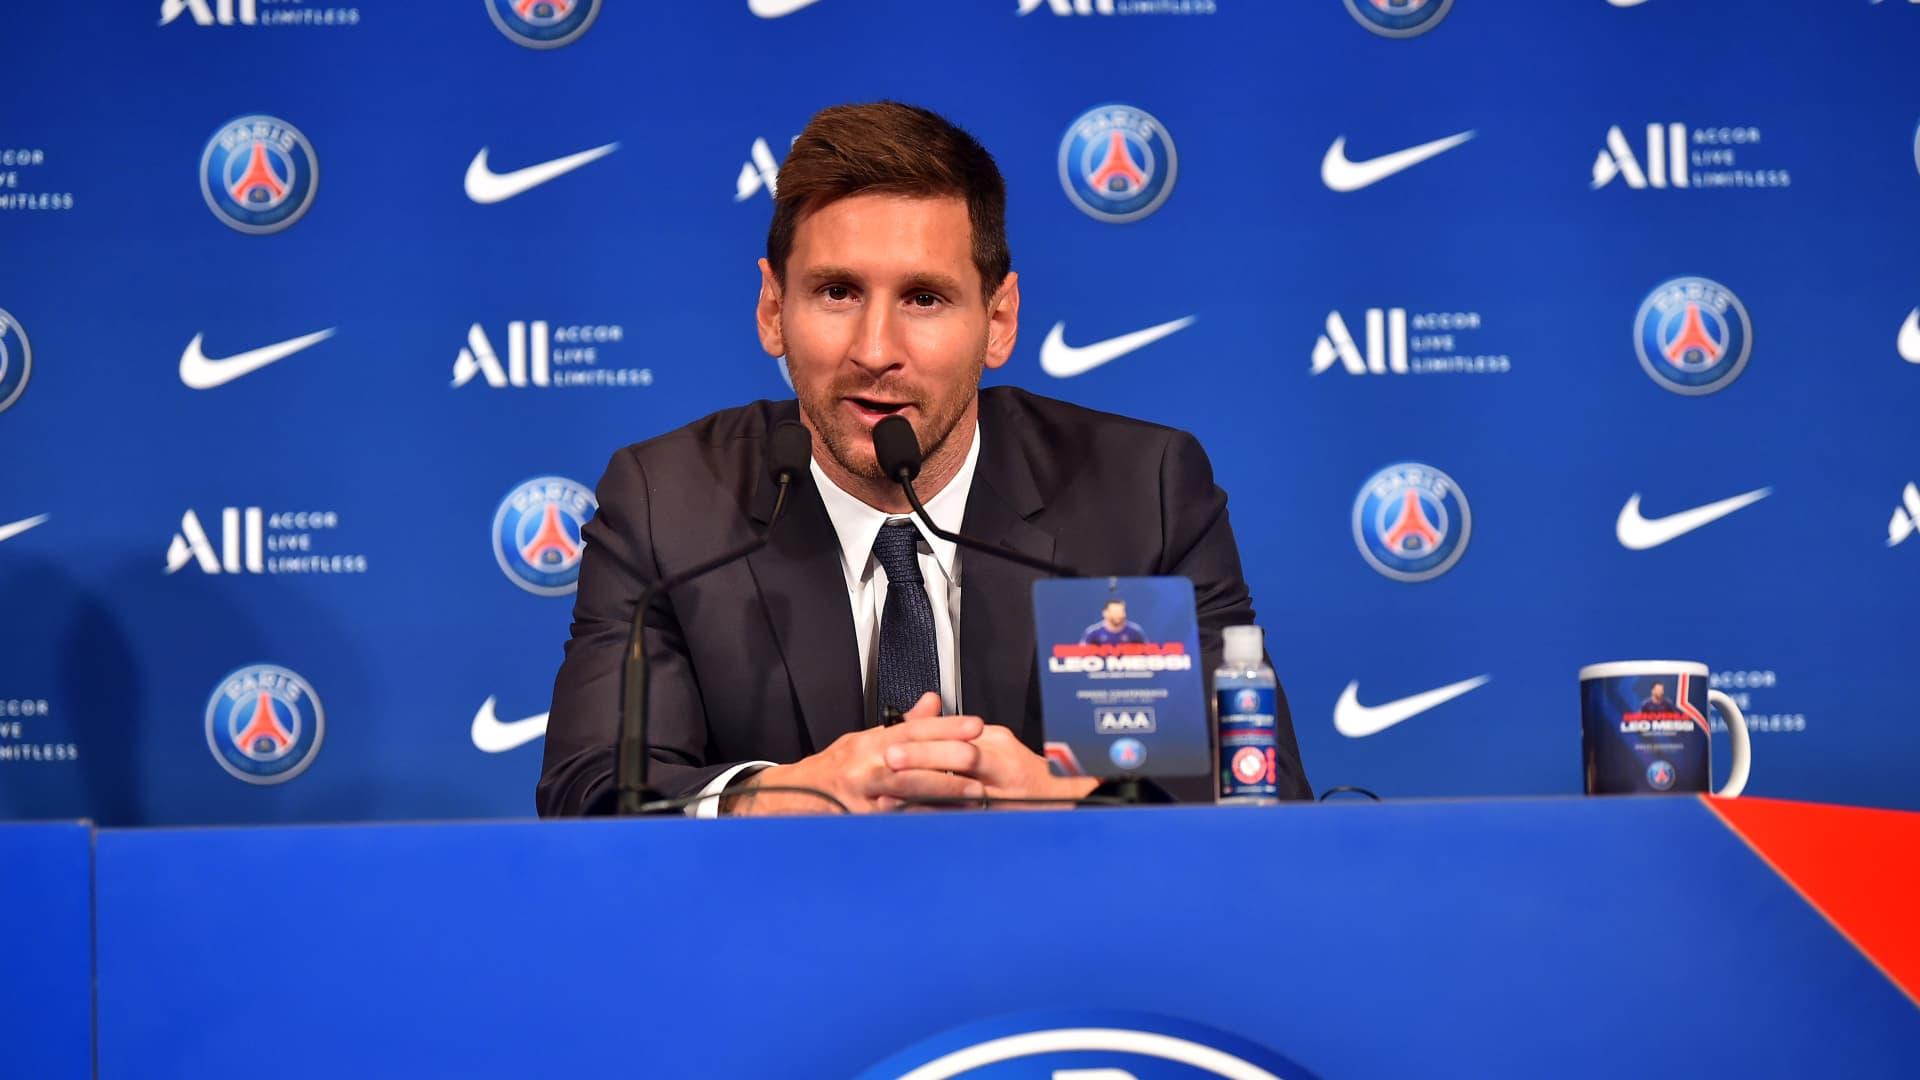 Lionel Messi answers journalists during the press conference of Paris Saint-Germain at Parc des Princes on August 11, 2021 in Paris, France.